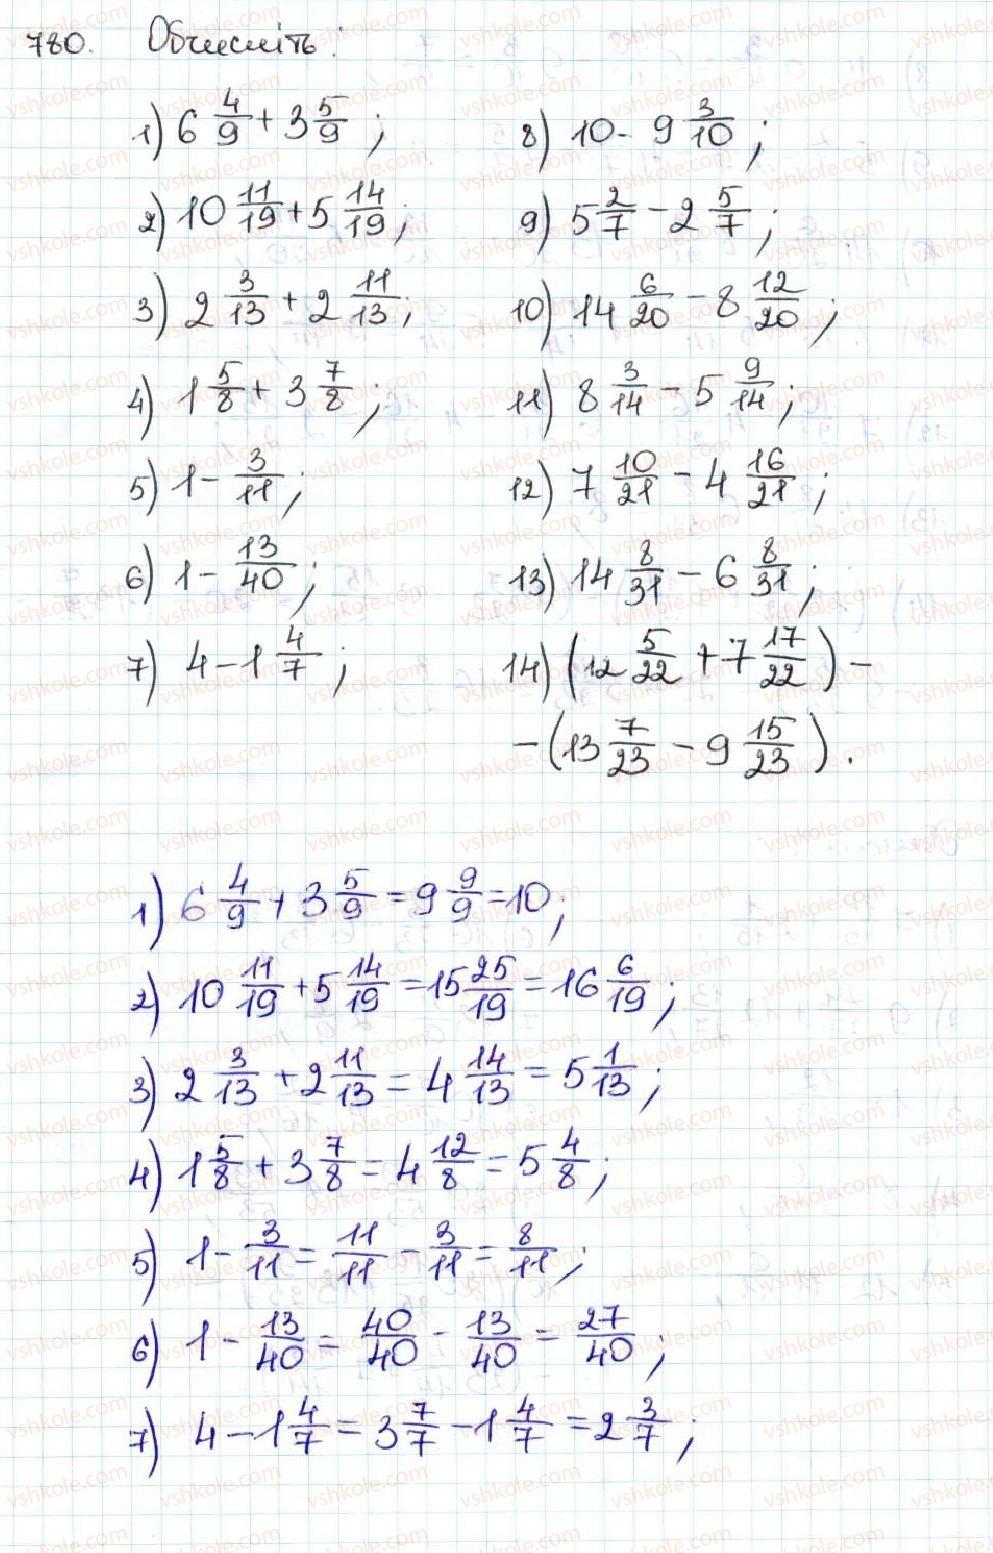 5-matematika-ag-merzlyak-vb-polonskij-ms-yakir-2013--4-zvichajni-drobi-29-mishani-chisla-780.jpg